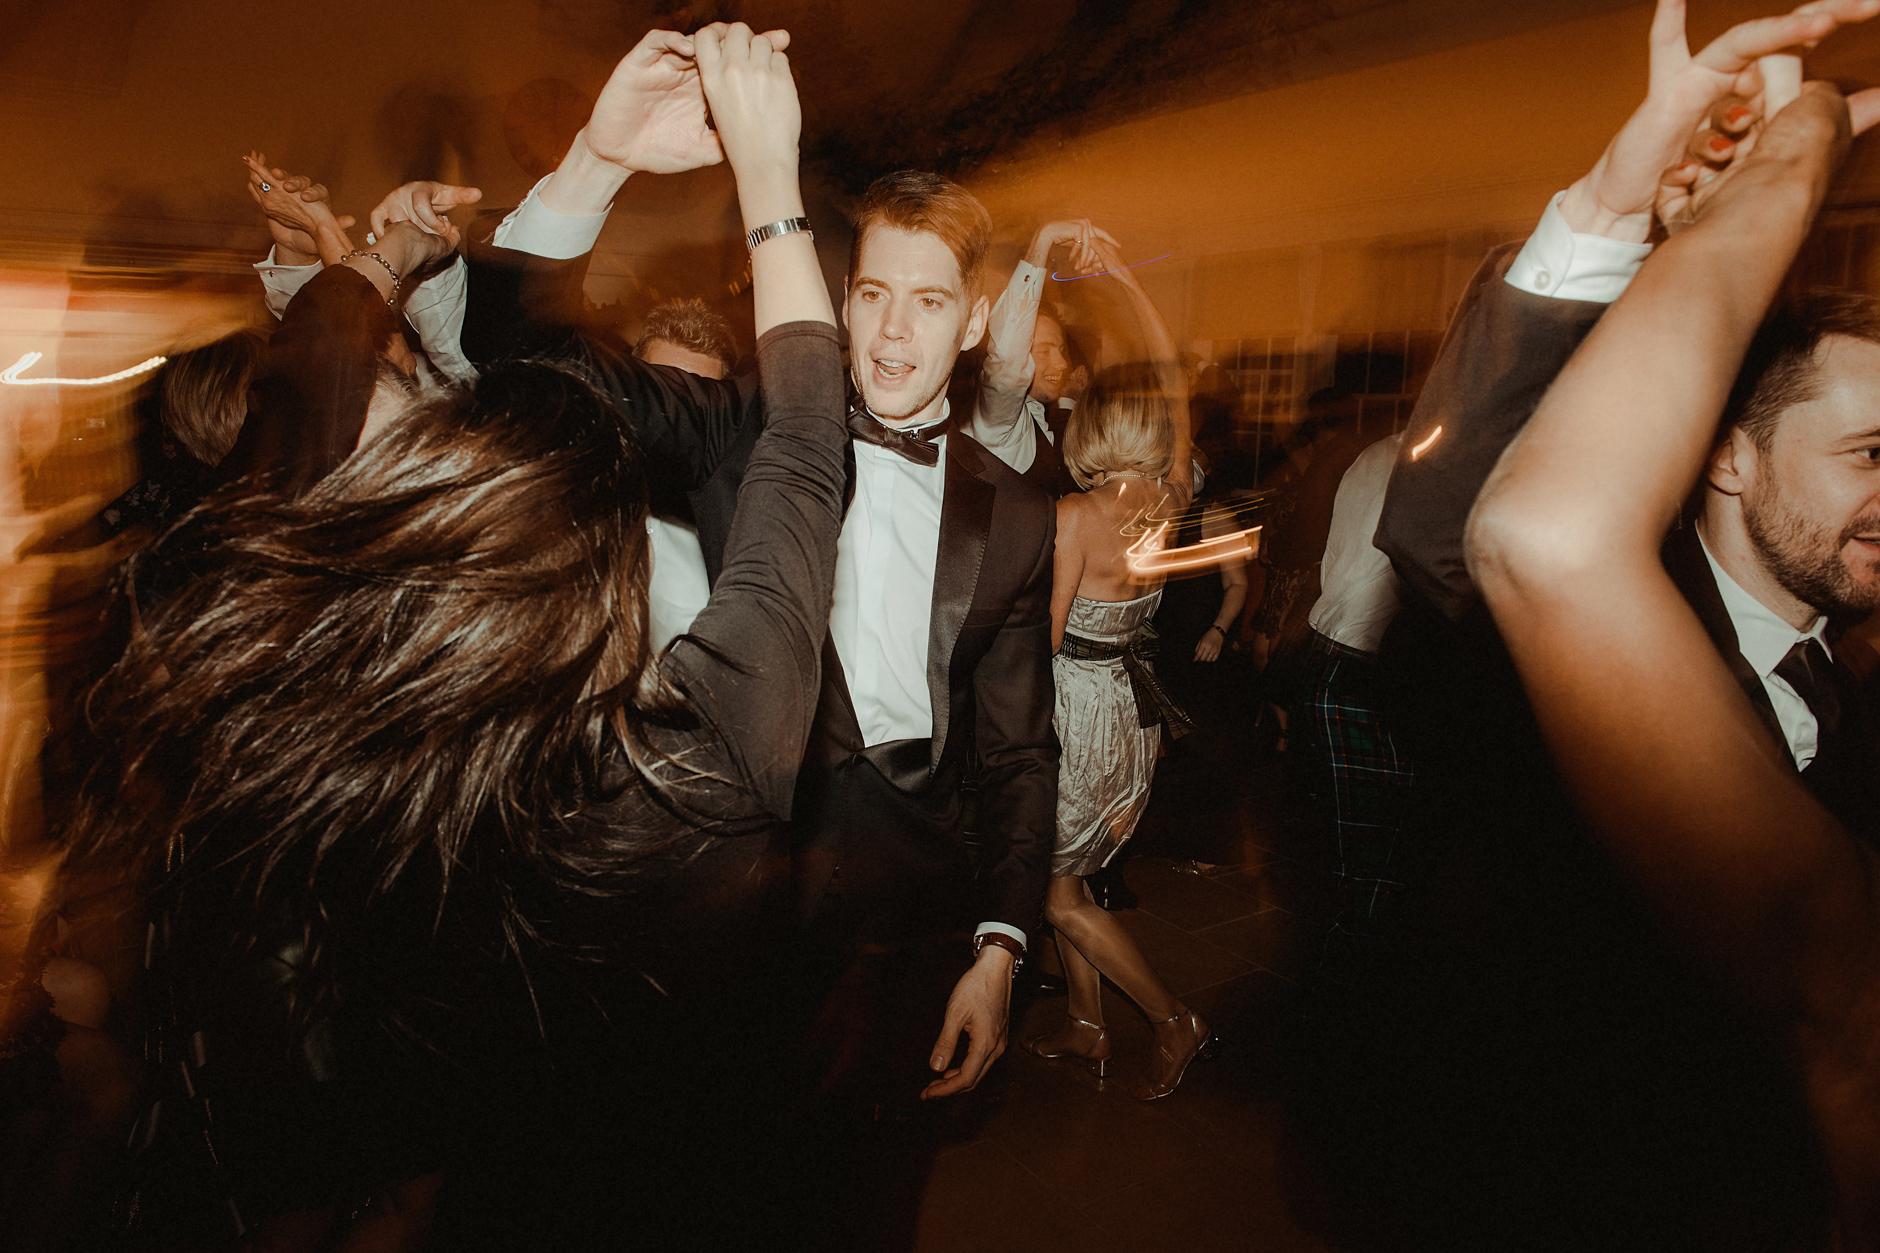 Glentruim-Wedding-Nikki-Leadbetter-Photography-394.jpg